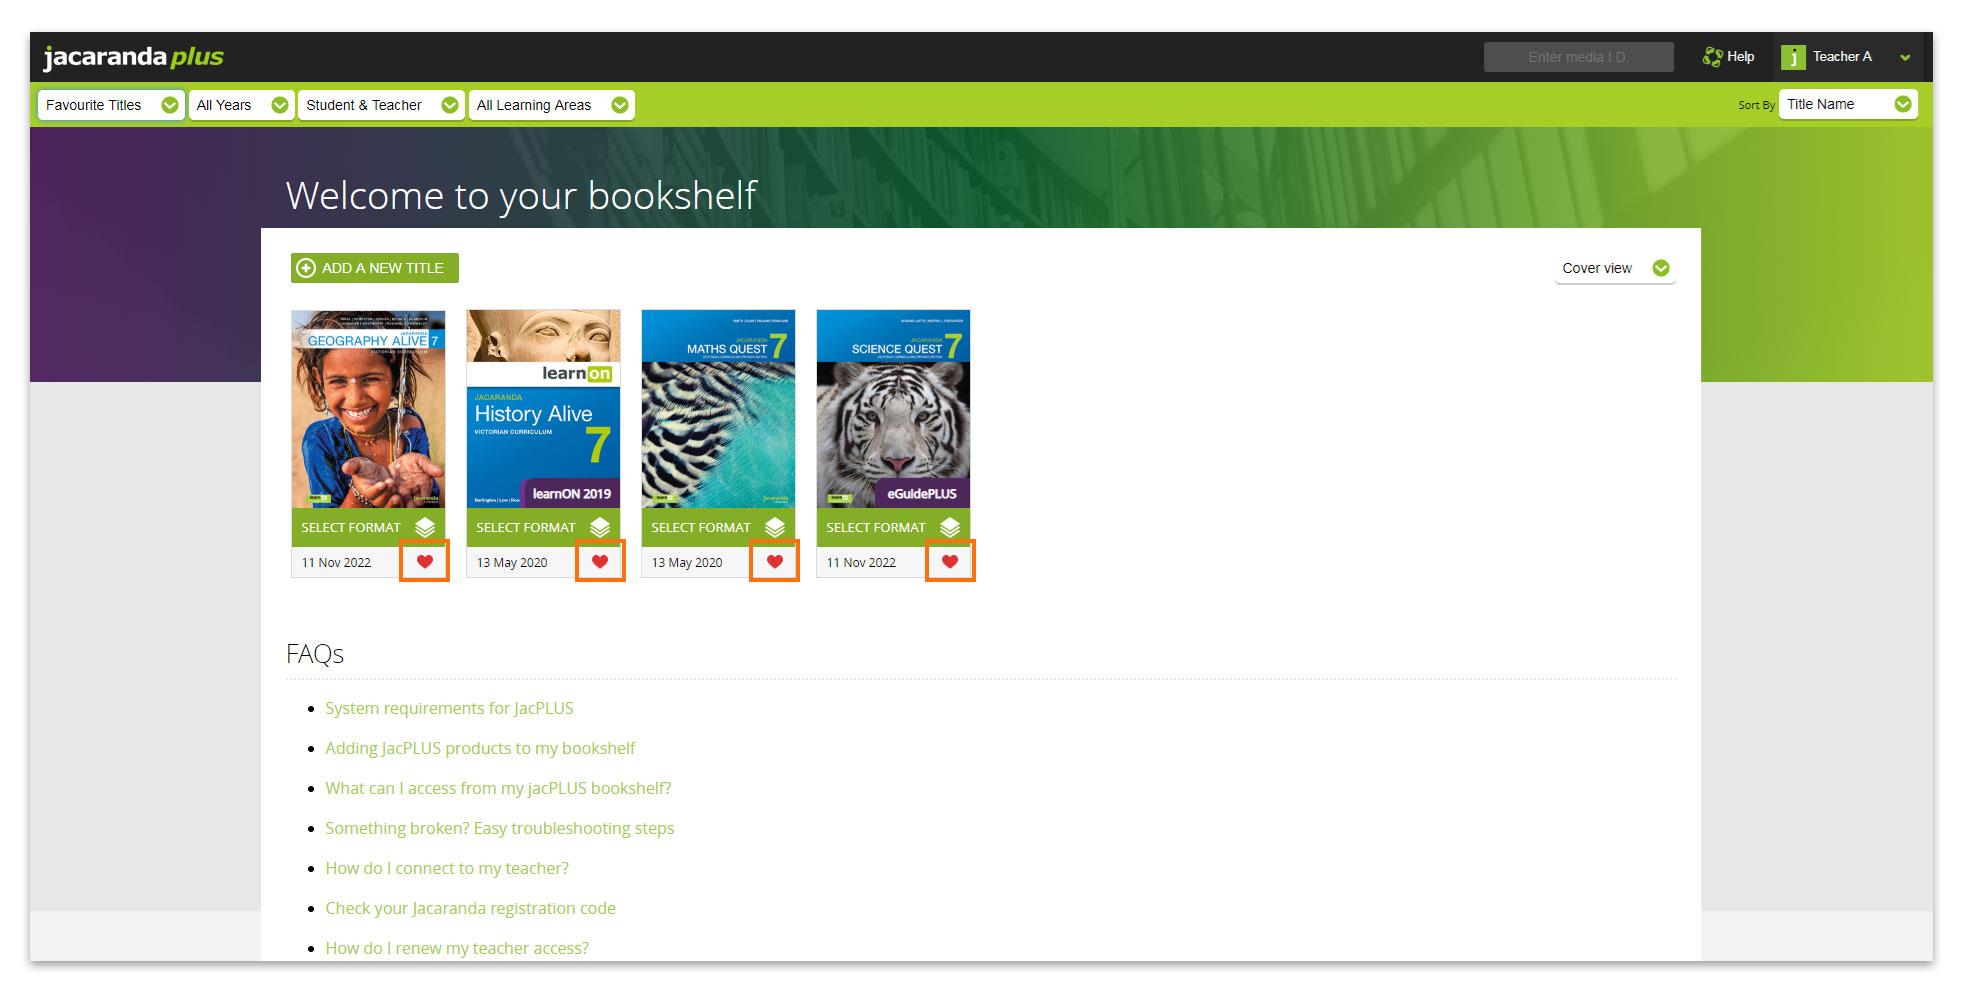 Jacaranda Bookshelf favourites